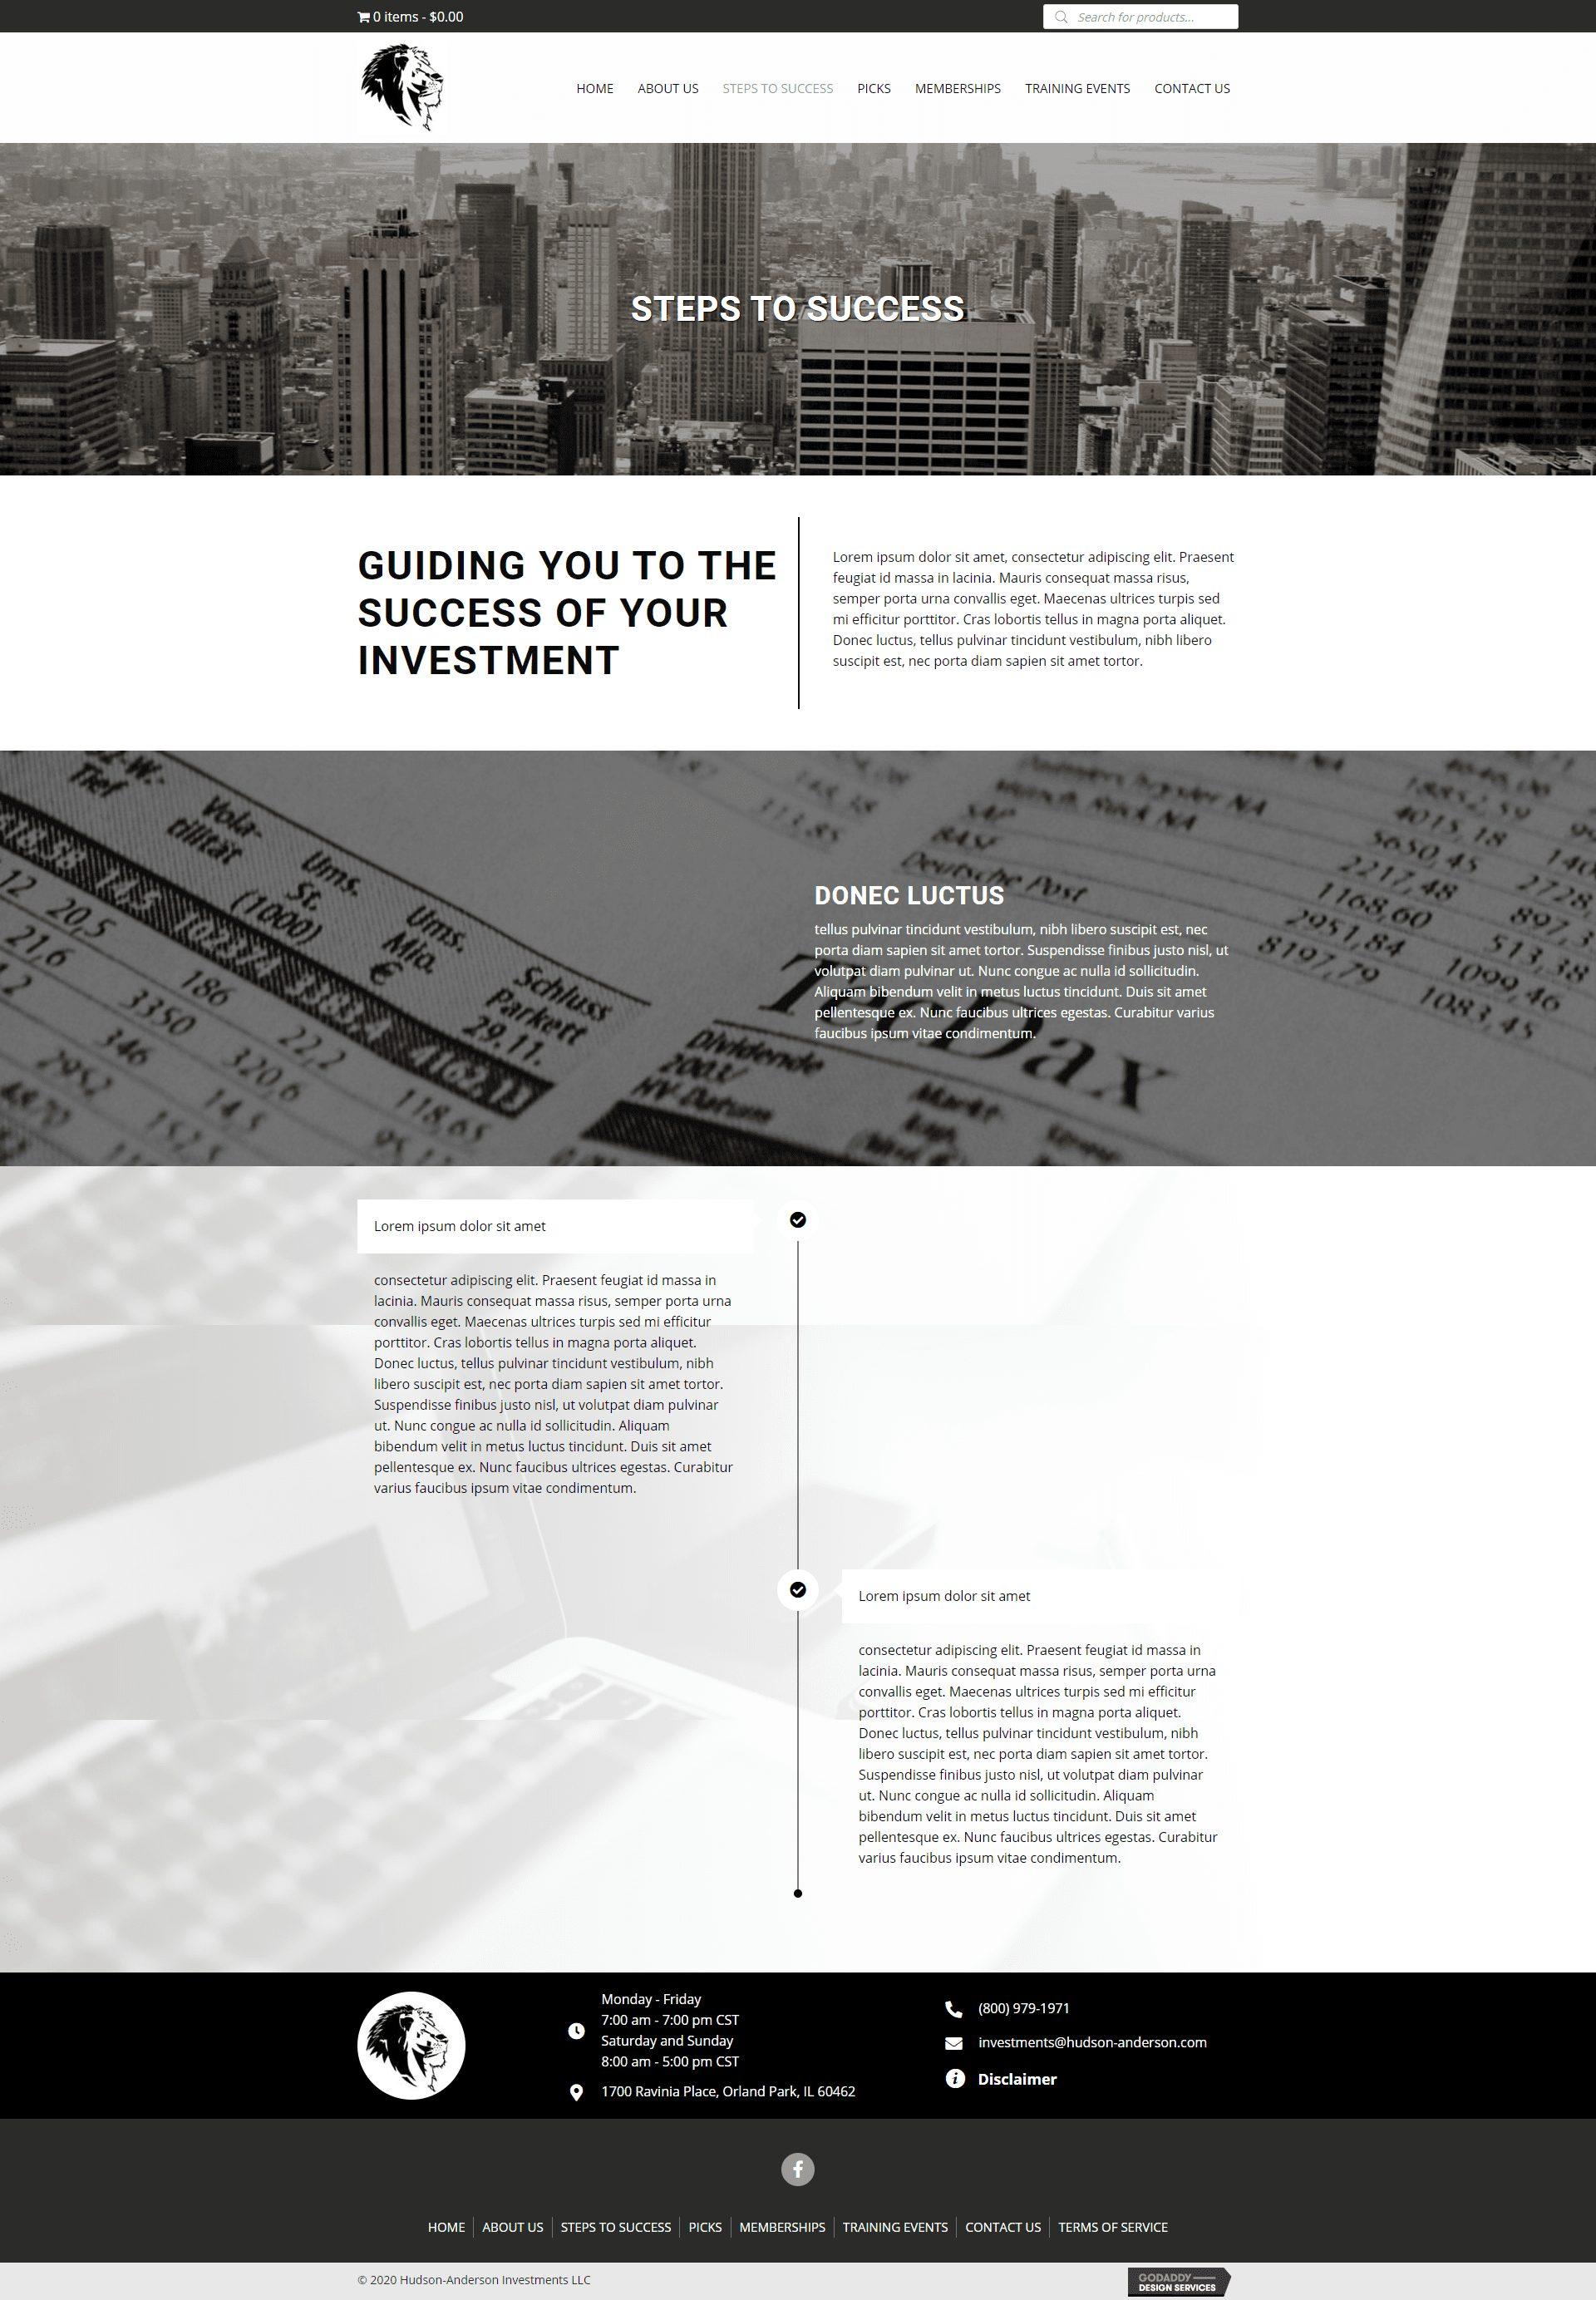 screencapture-e17-49e-myftpupload-steps-to-success